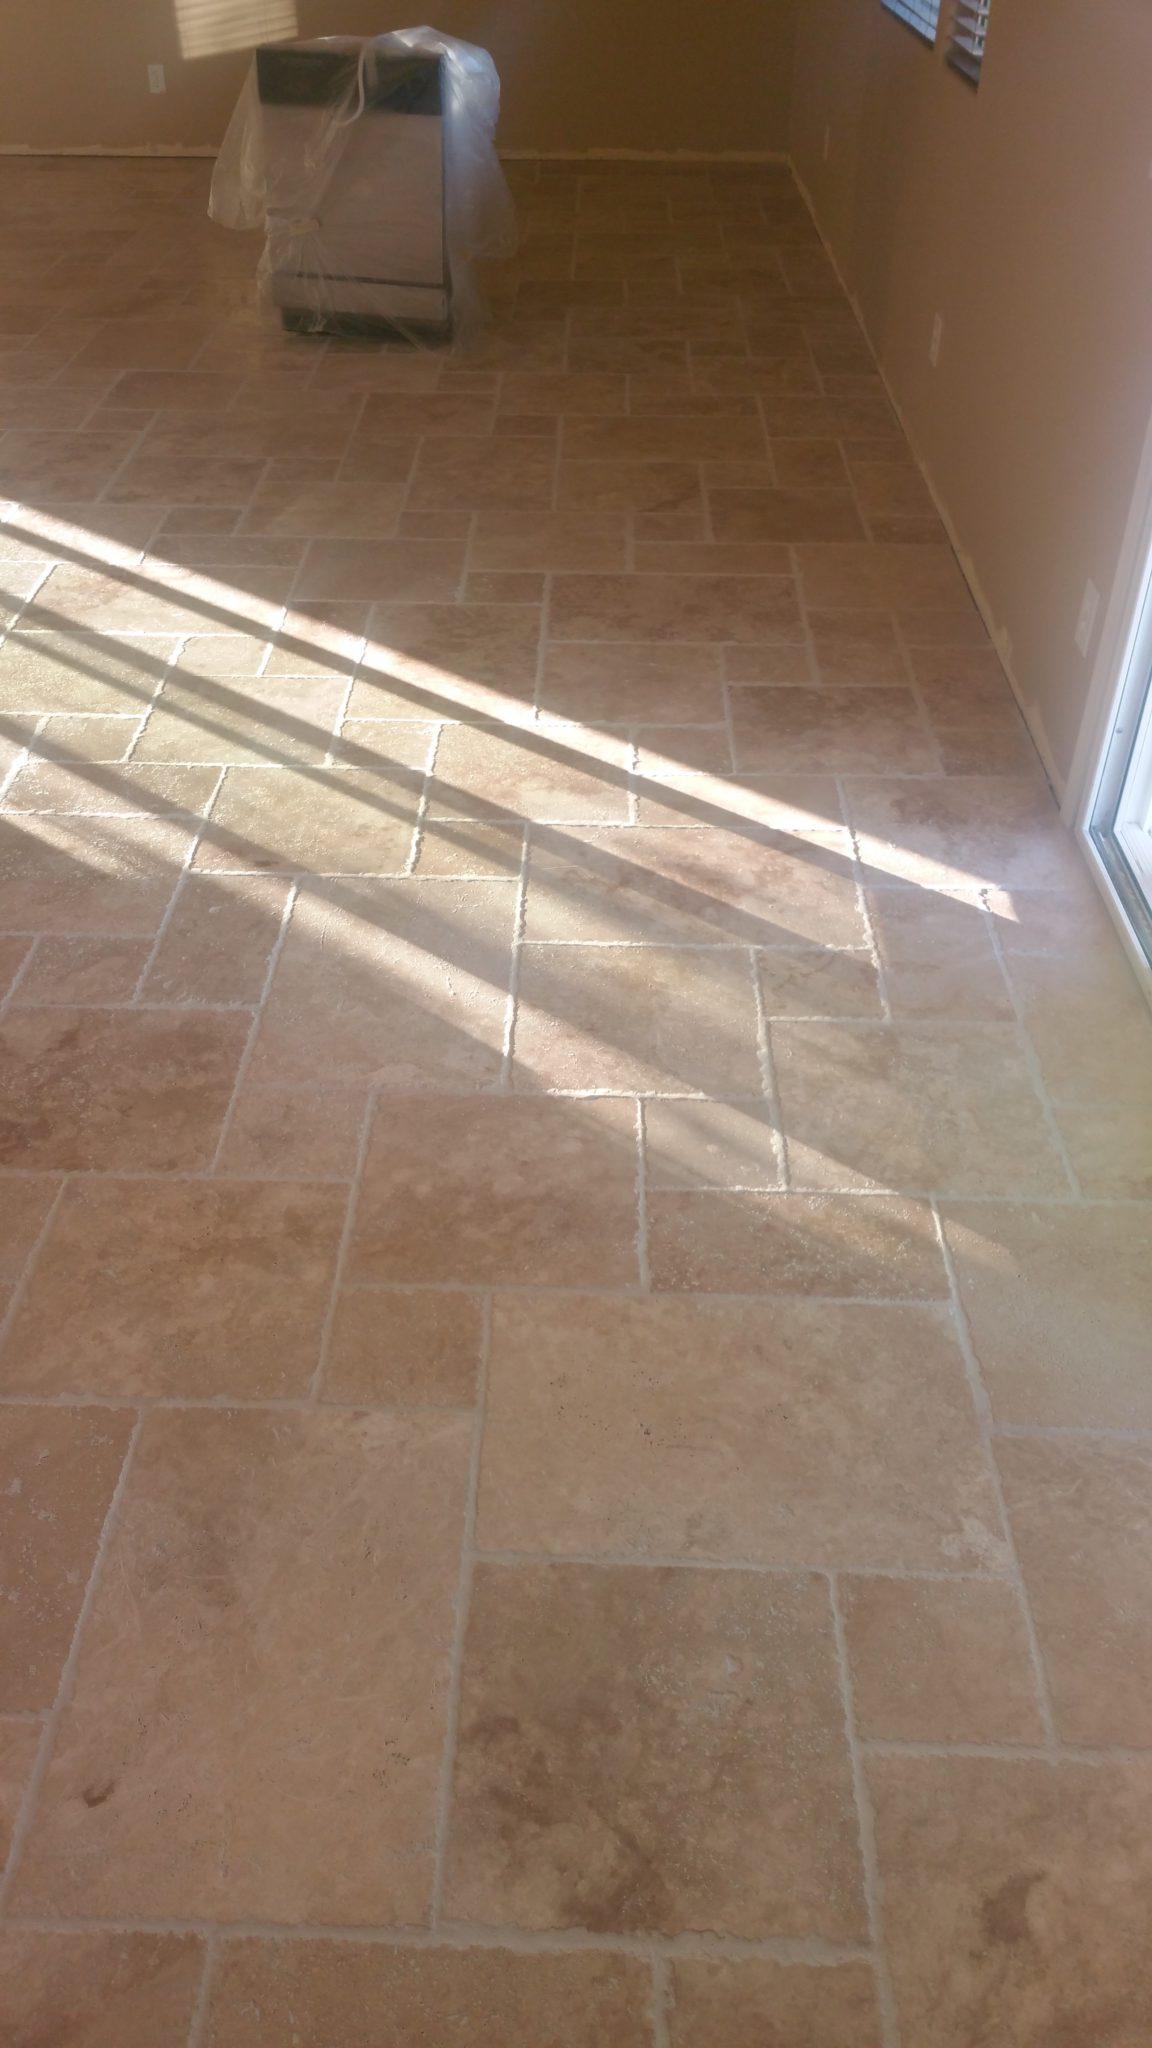 Ivory Beige Travertine Tile Qdi Surfaces